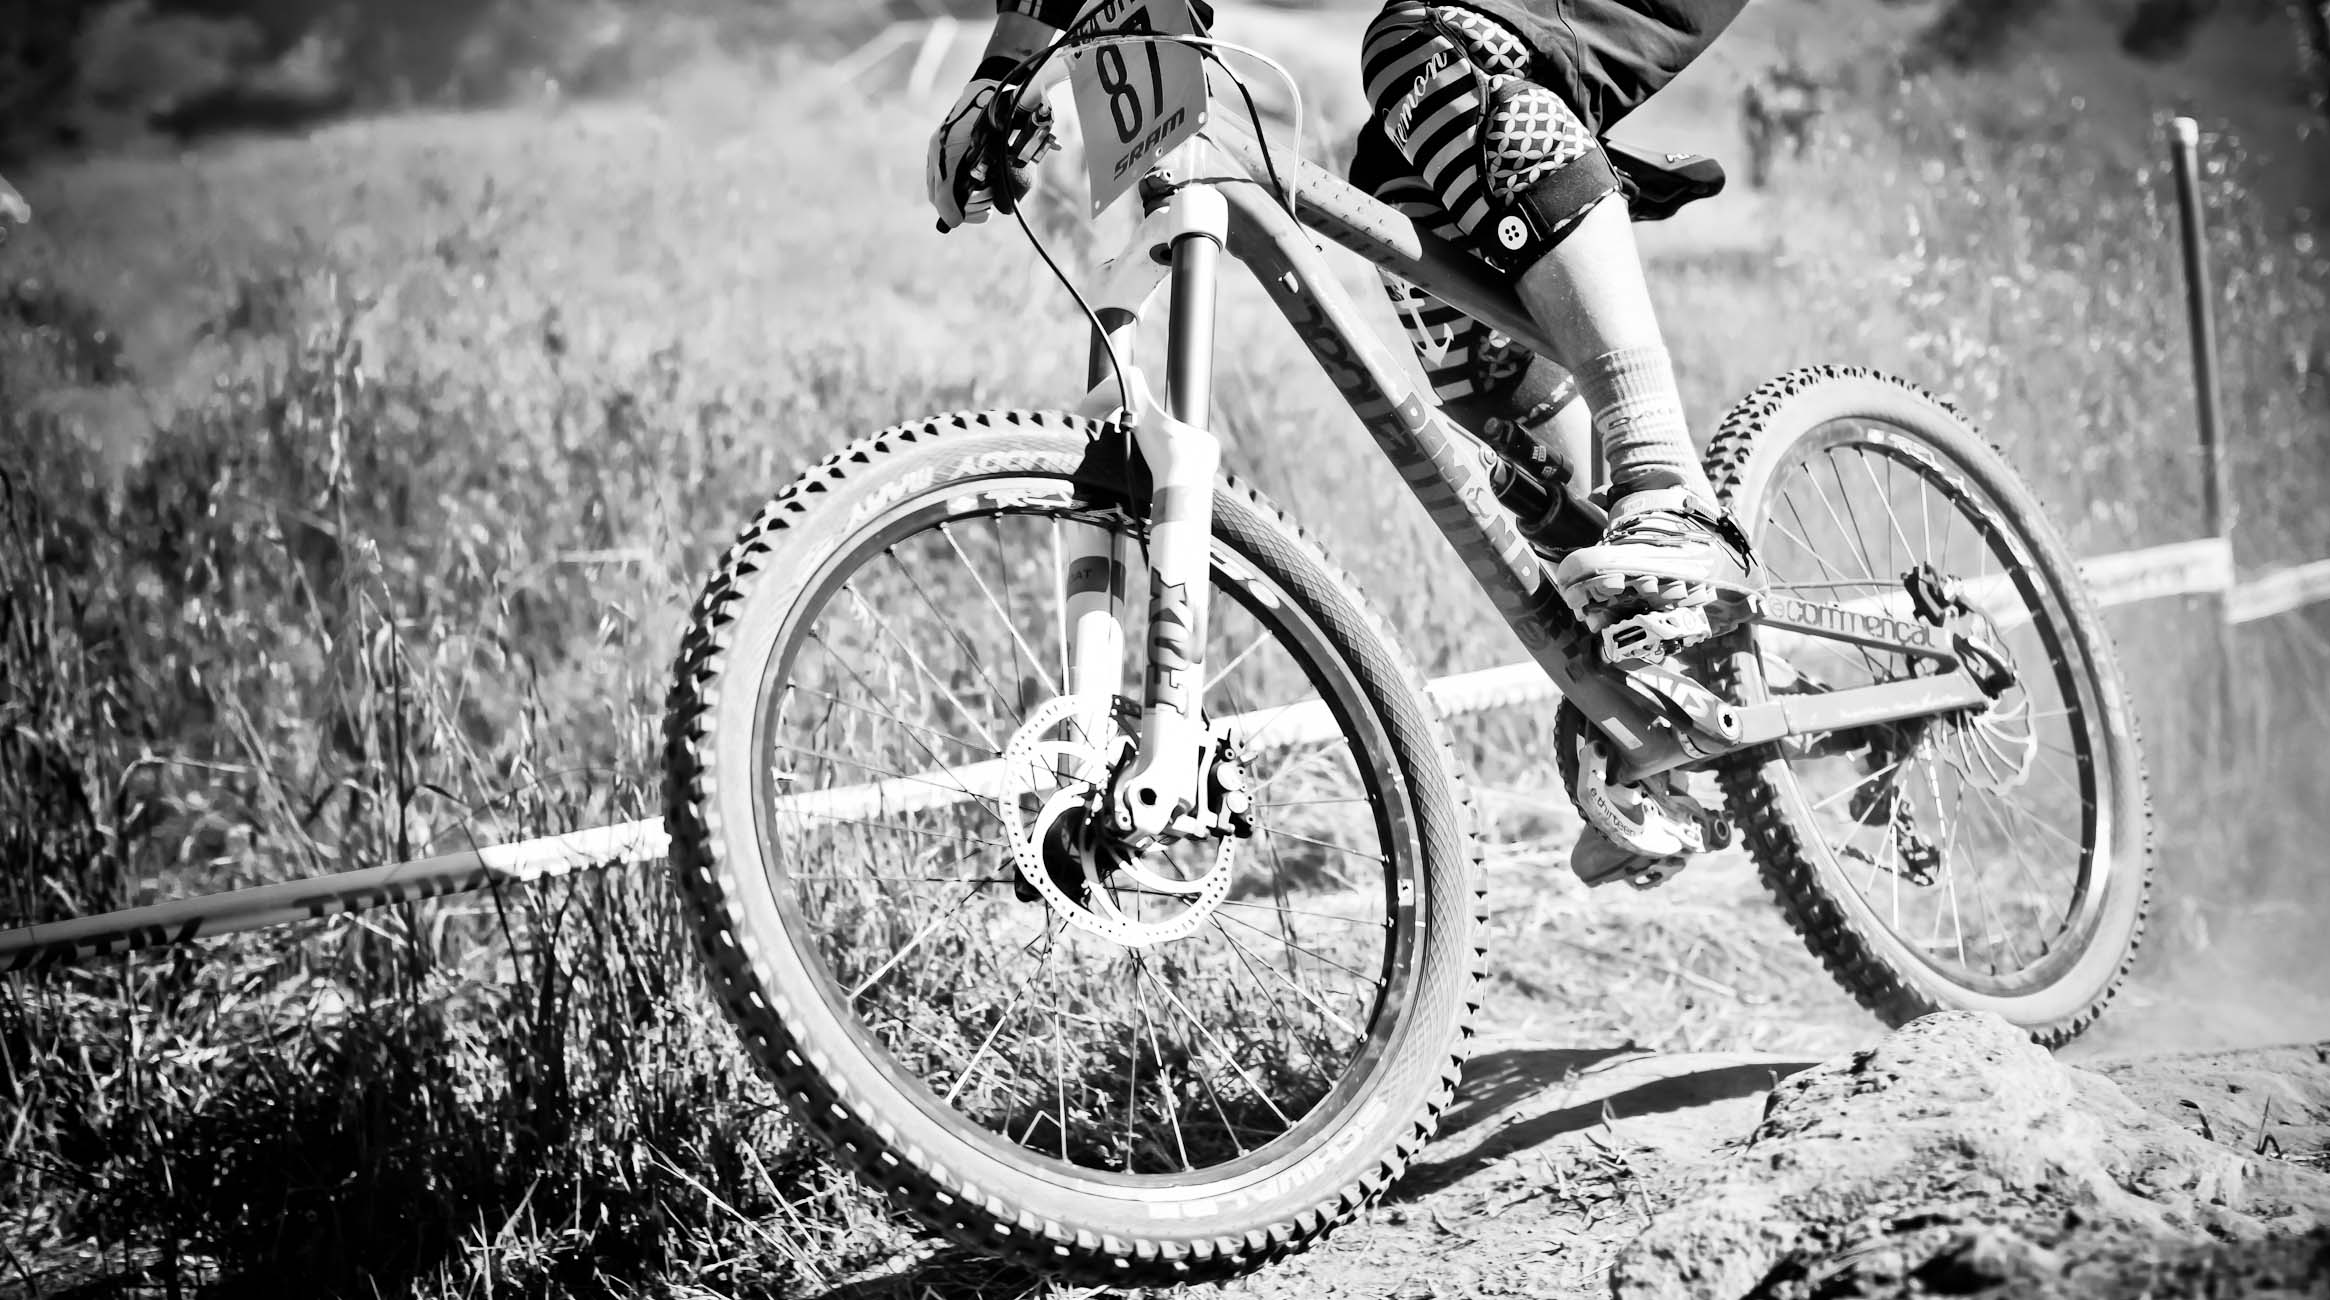 Mountain bike downhill racer closup